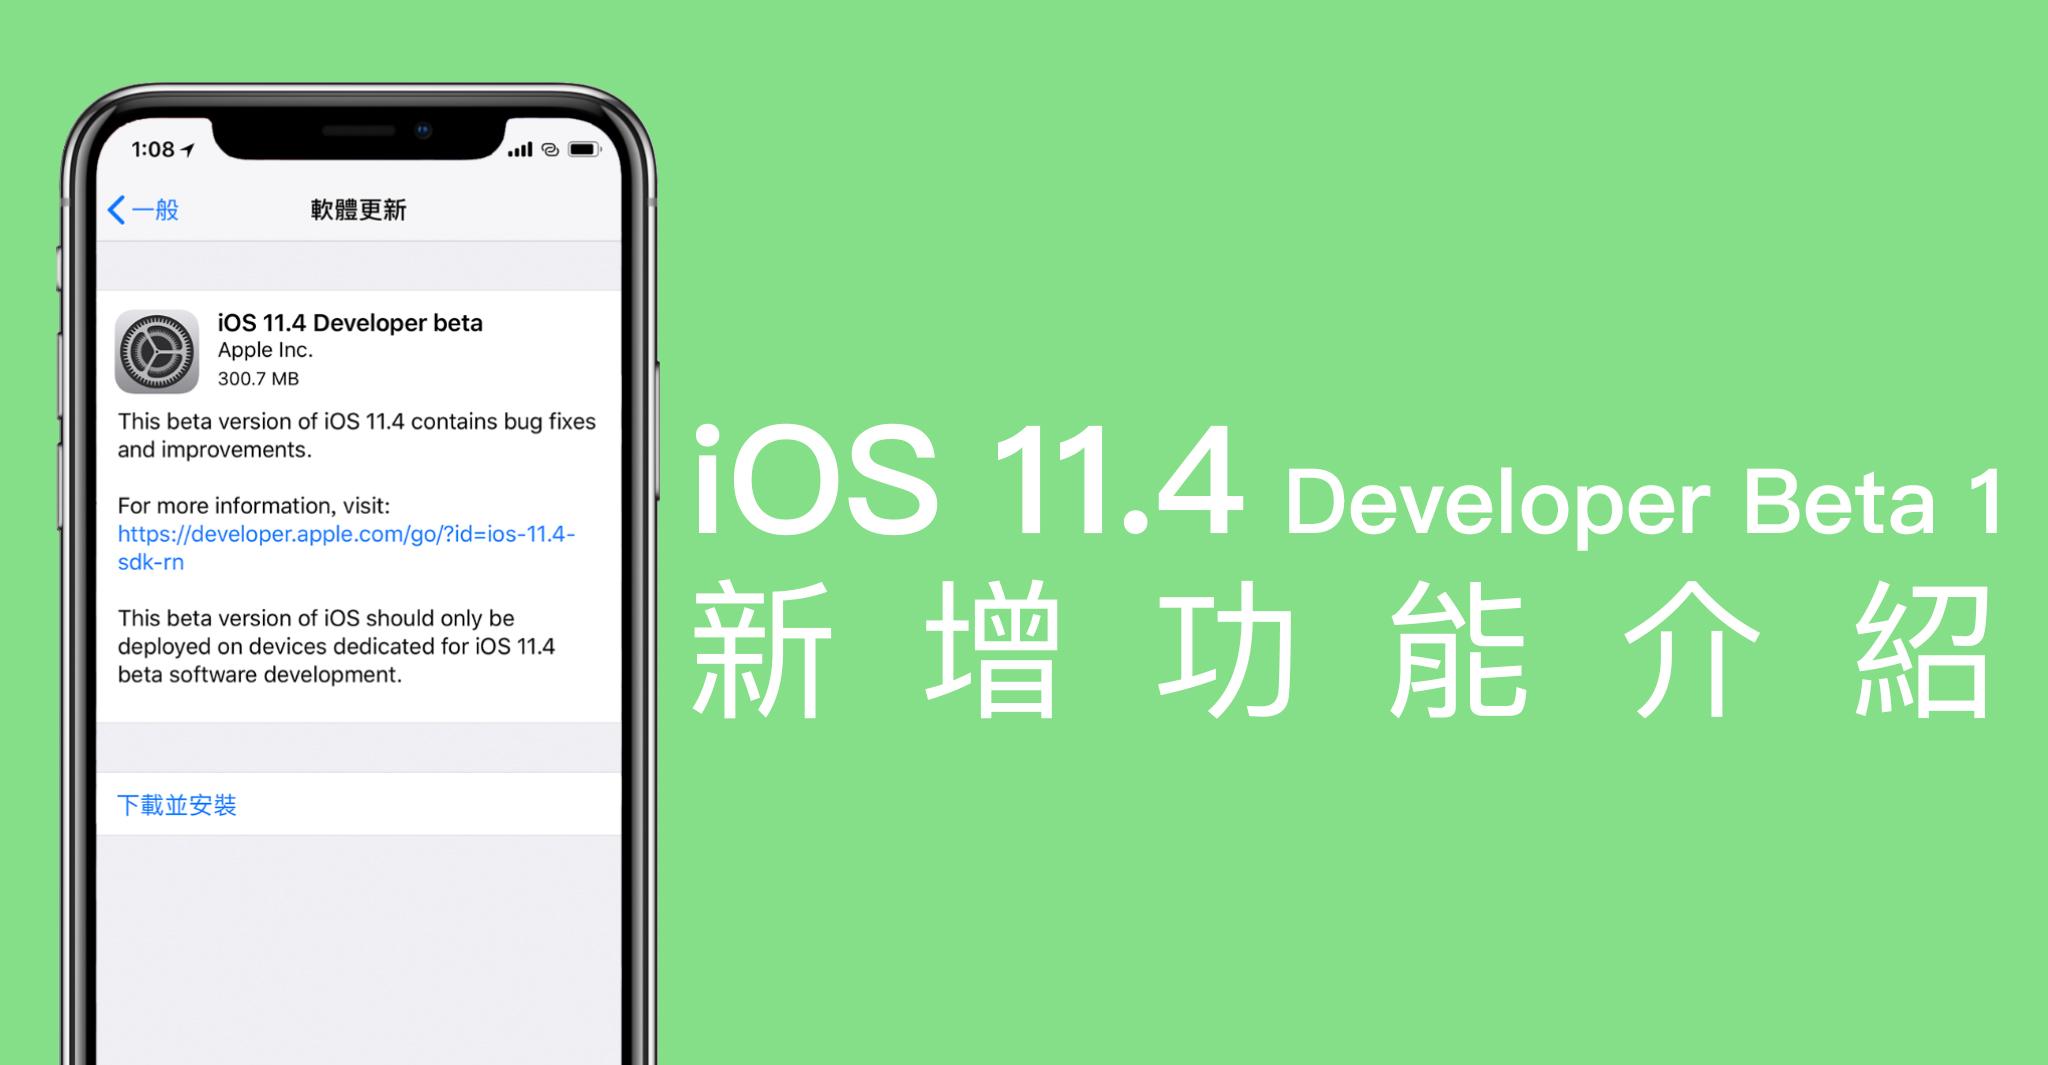 iOS 11.4 Developer Beta 1 新增功能介紹